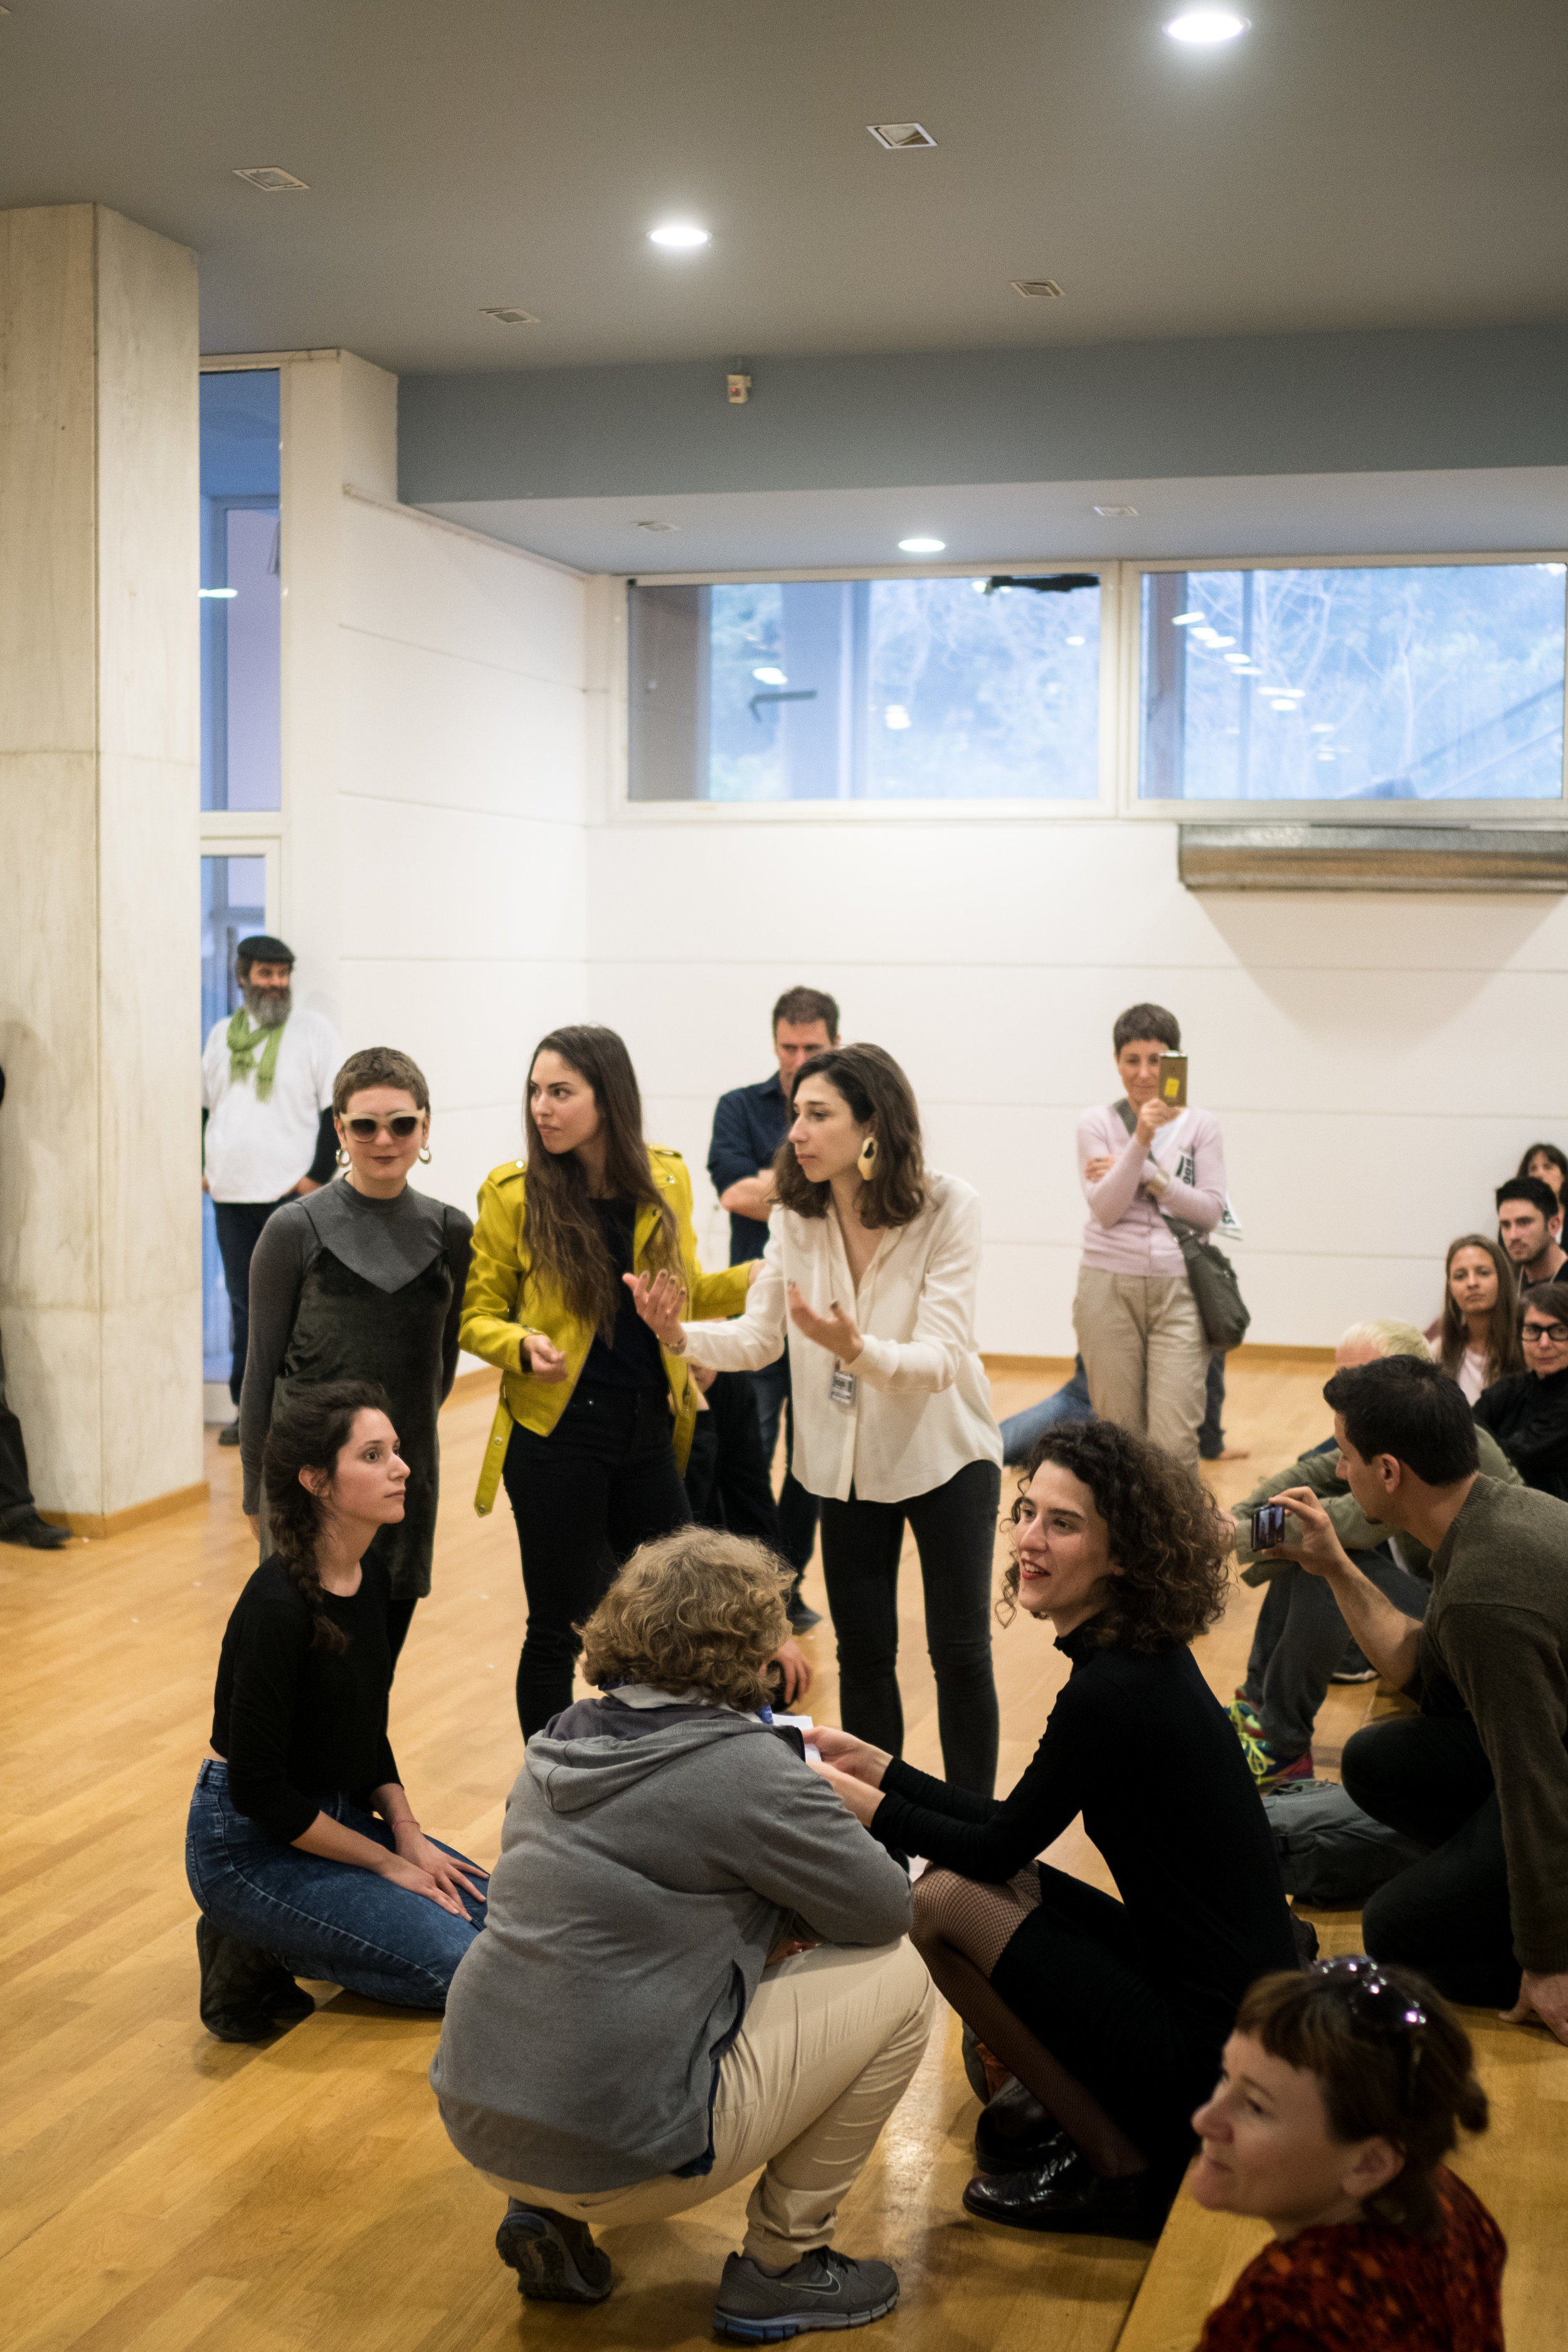 Mattin with Dafni Krazoudi, Danai Liodaki, Ioannis Sarris, and Eleni Zervou , Social Dissonance , 2017, durational concert, 163 days, documenta 14, Athens